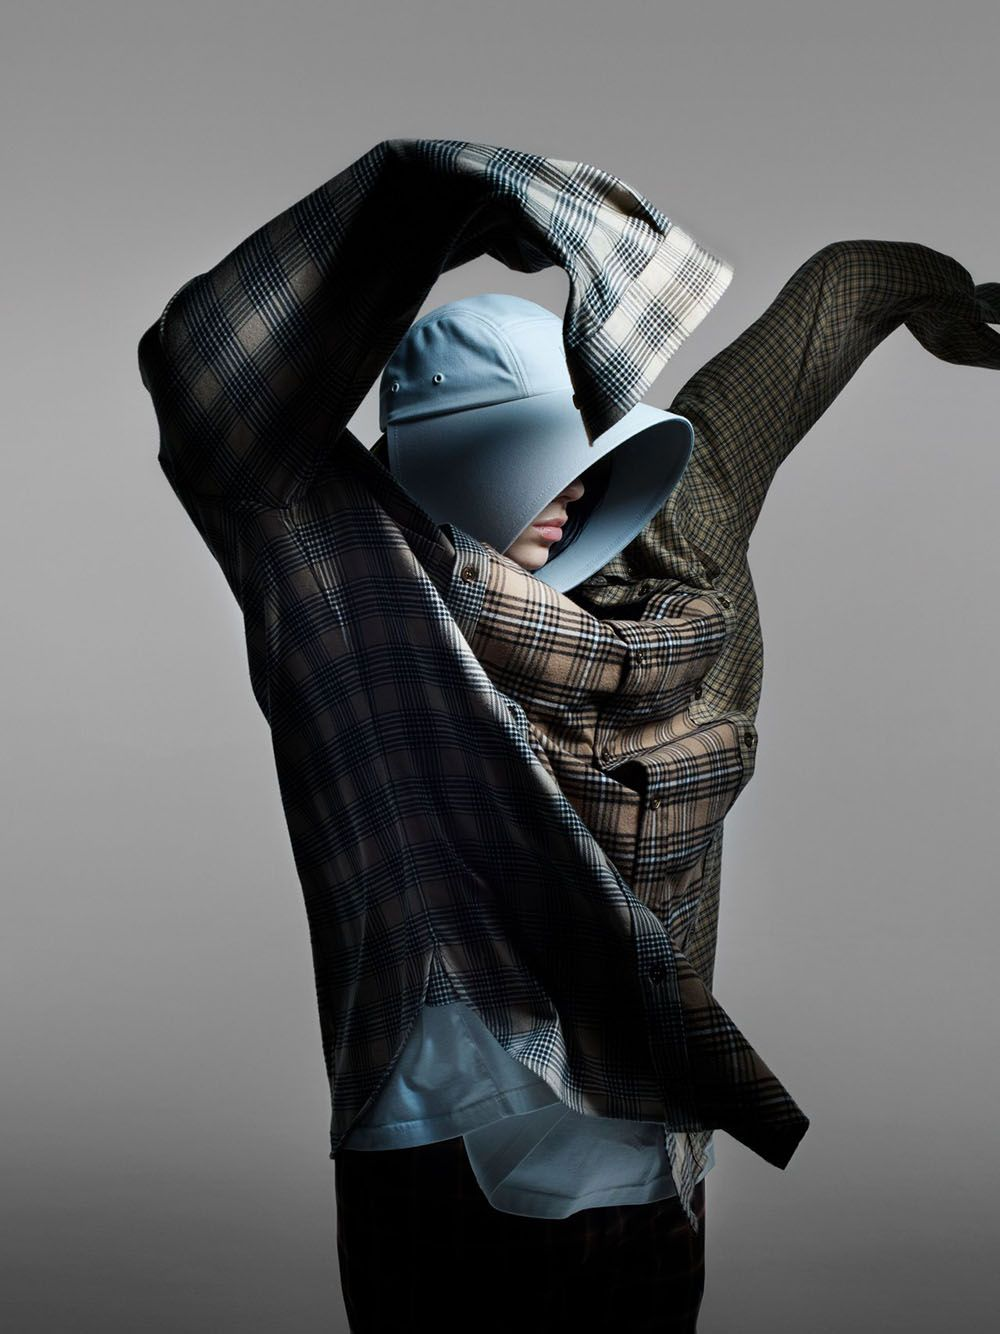 Billie Eilish covers Vogue China June 2020 by Nick Knight -  fashionotography | Billie eilish, Billie, Vogue photoshoot